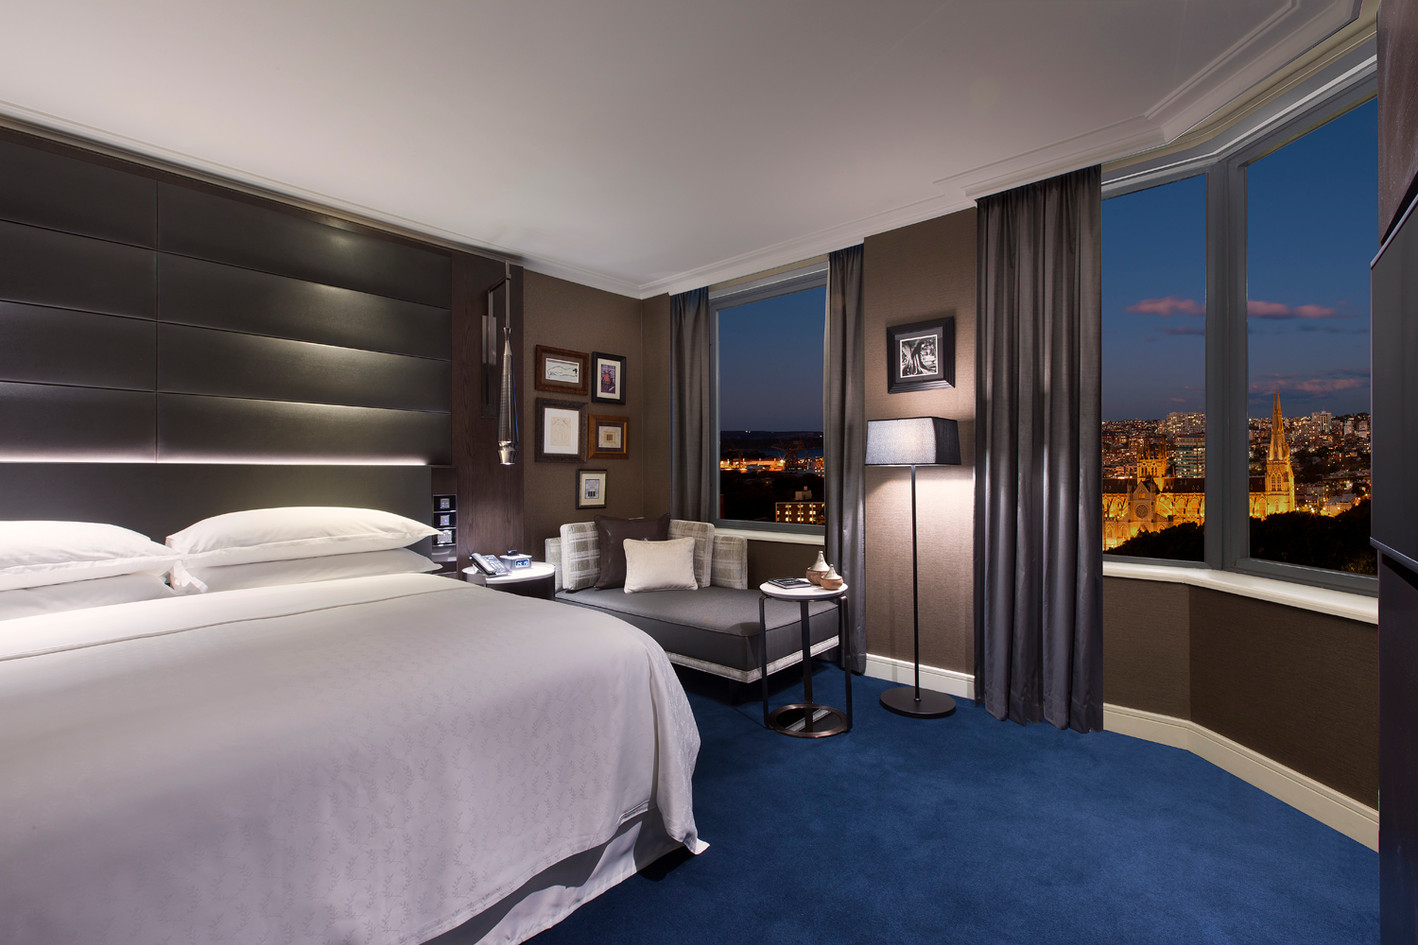 006_Grand Executive Suite_Bedroom.jpg